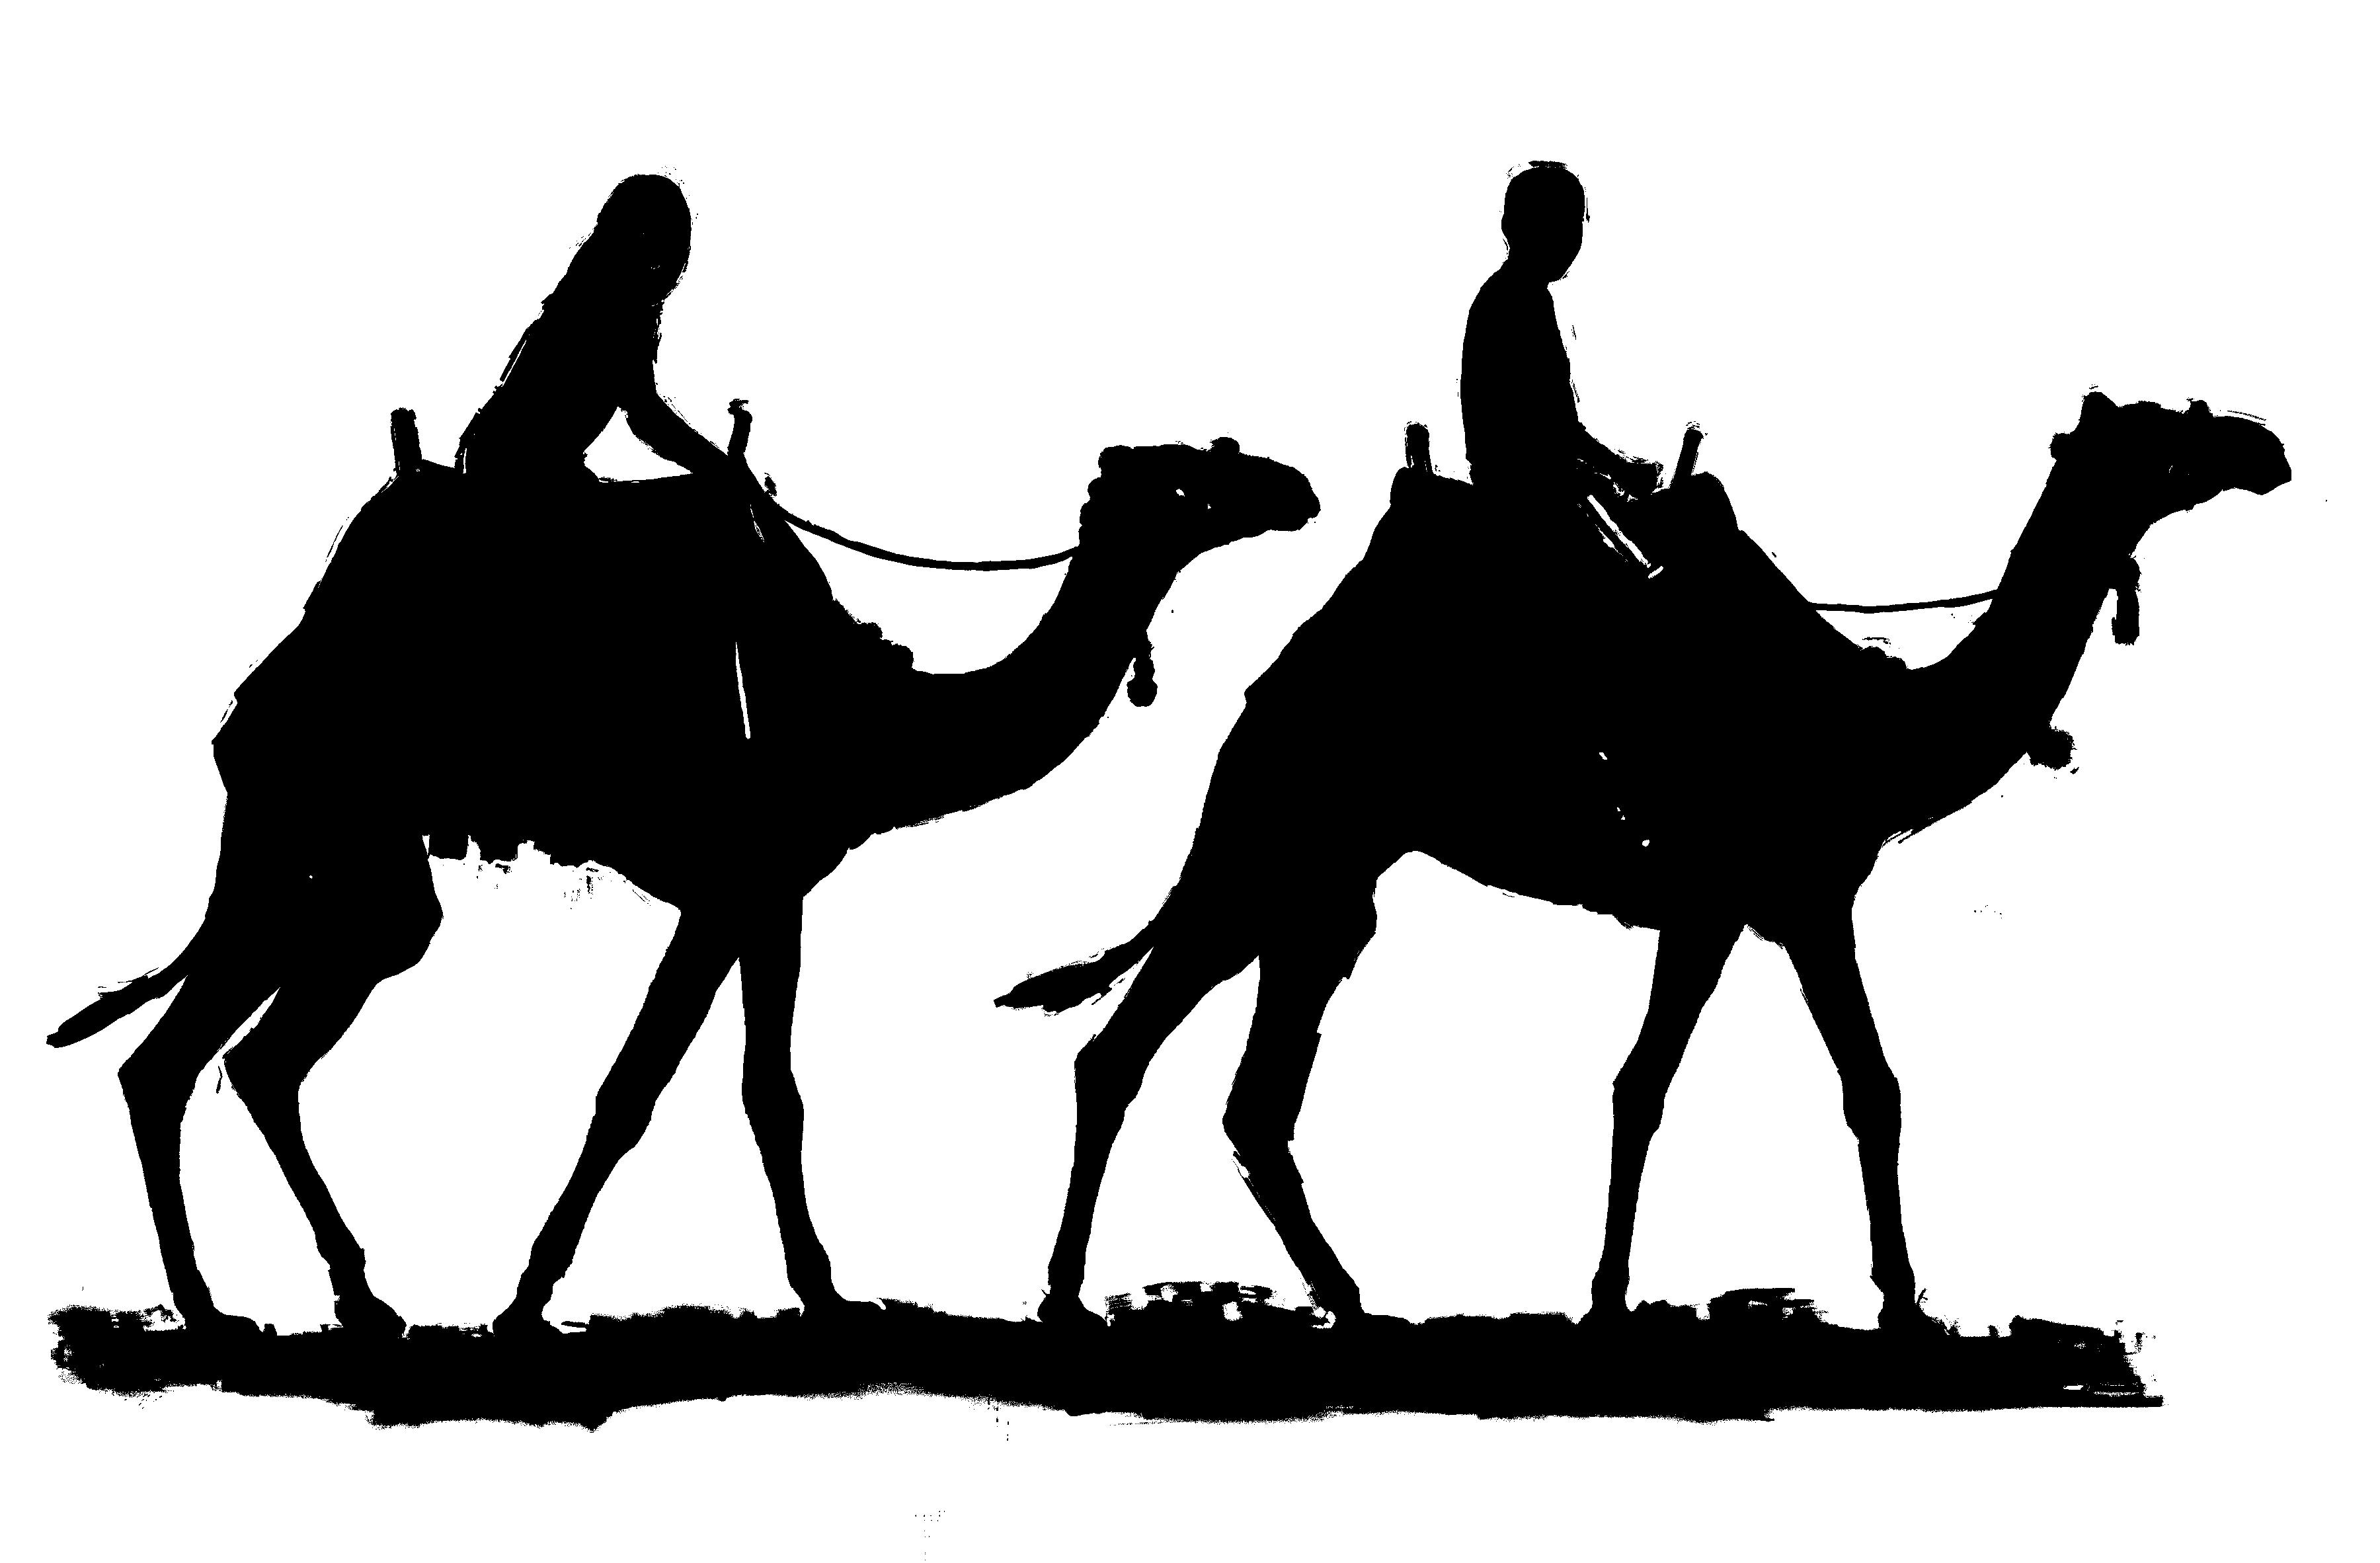 Desert clipart journey. Free cliparts download clip